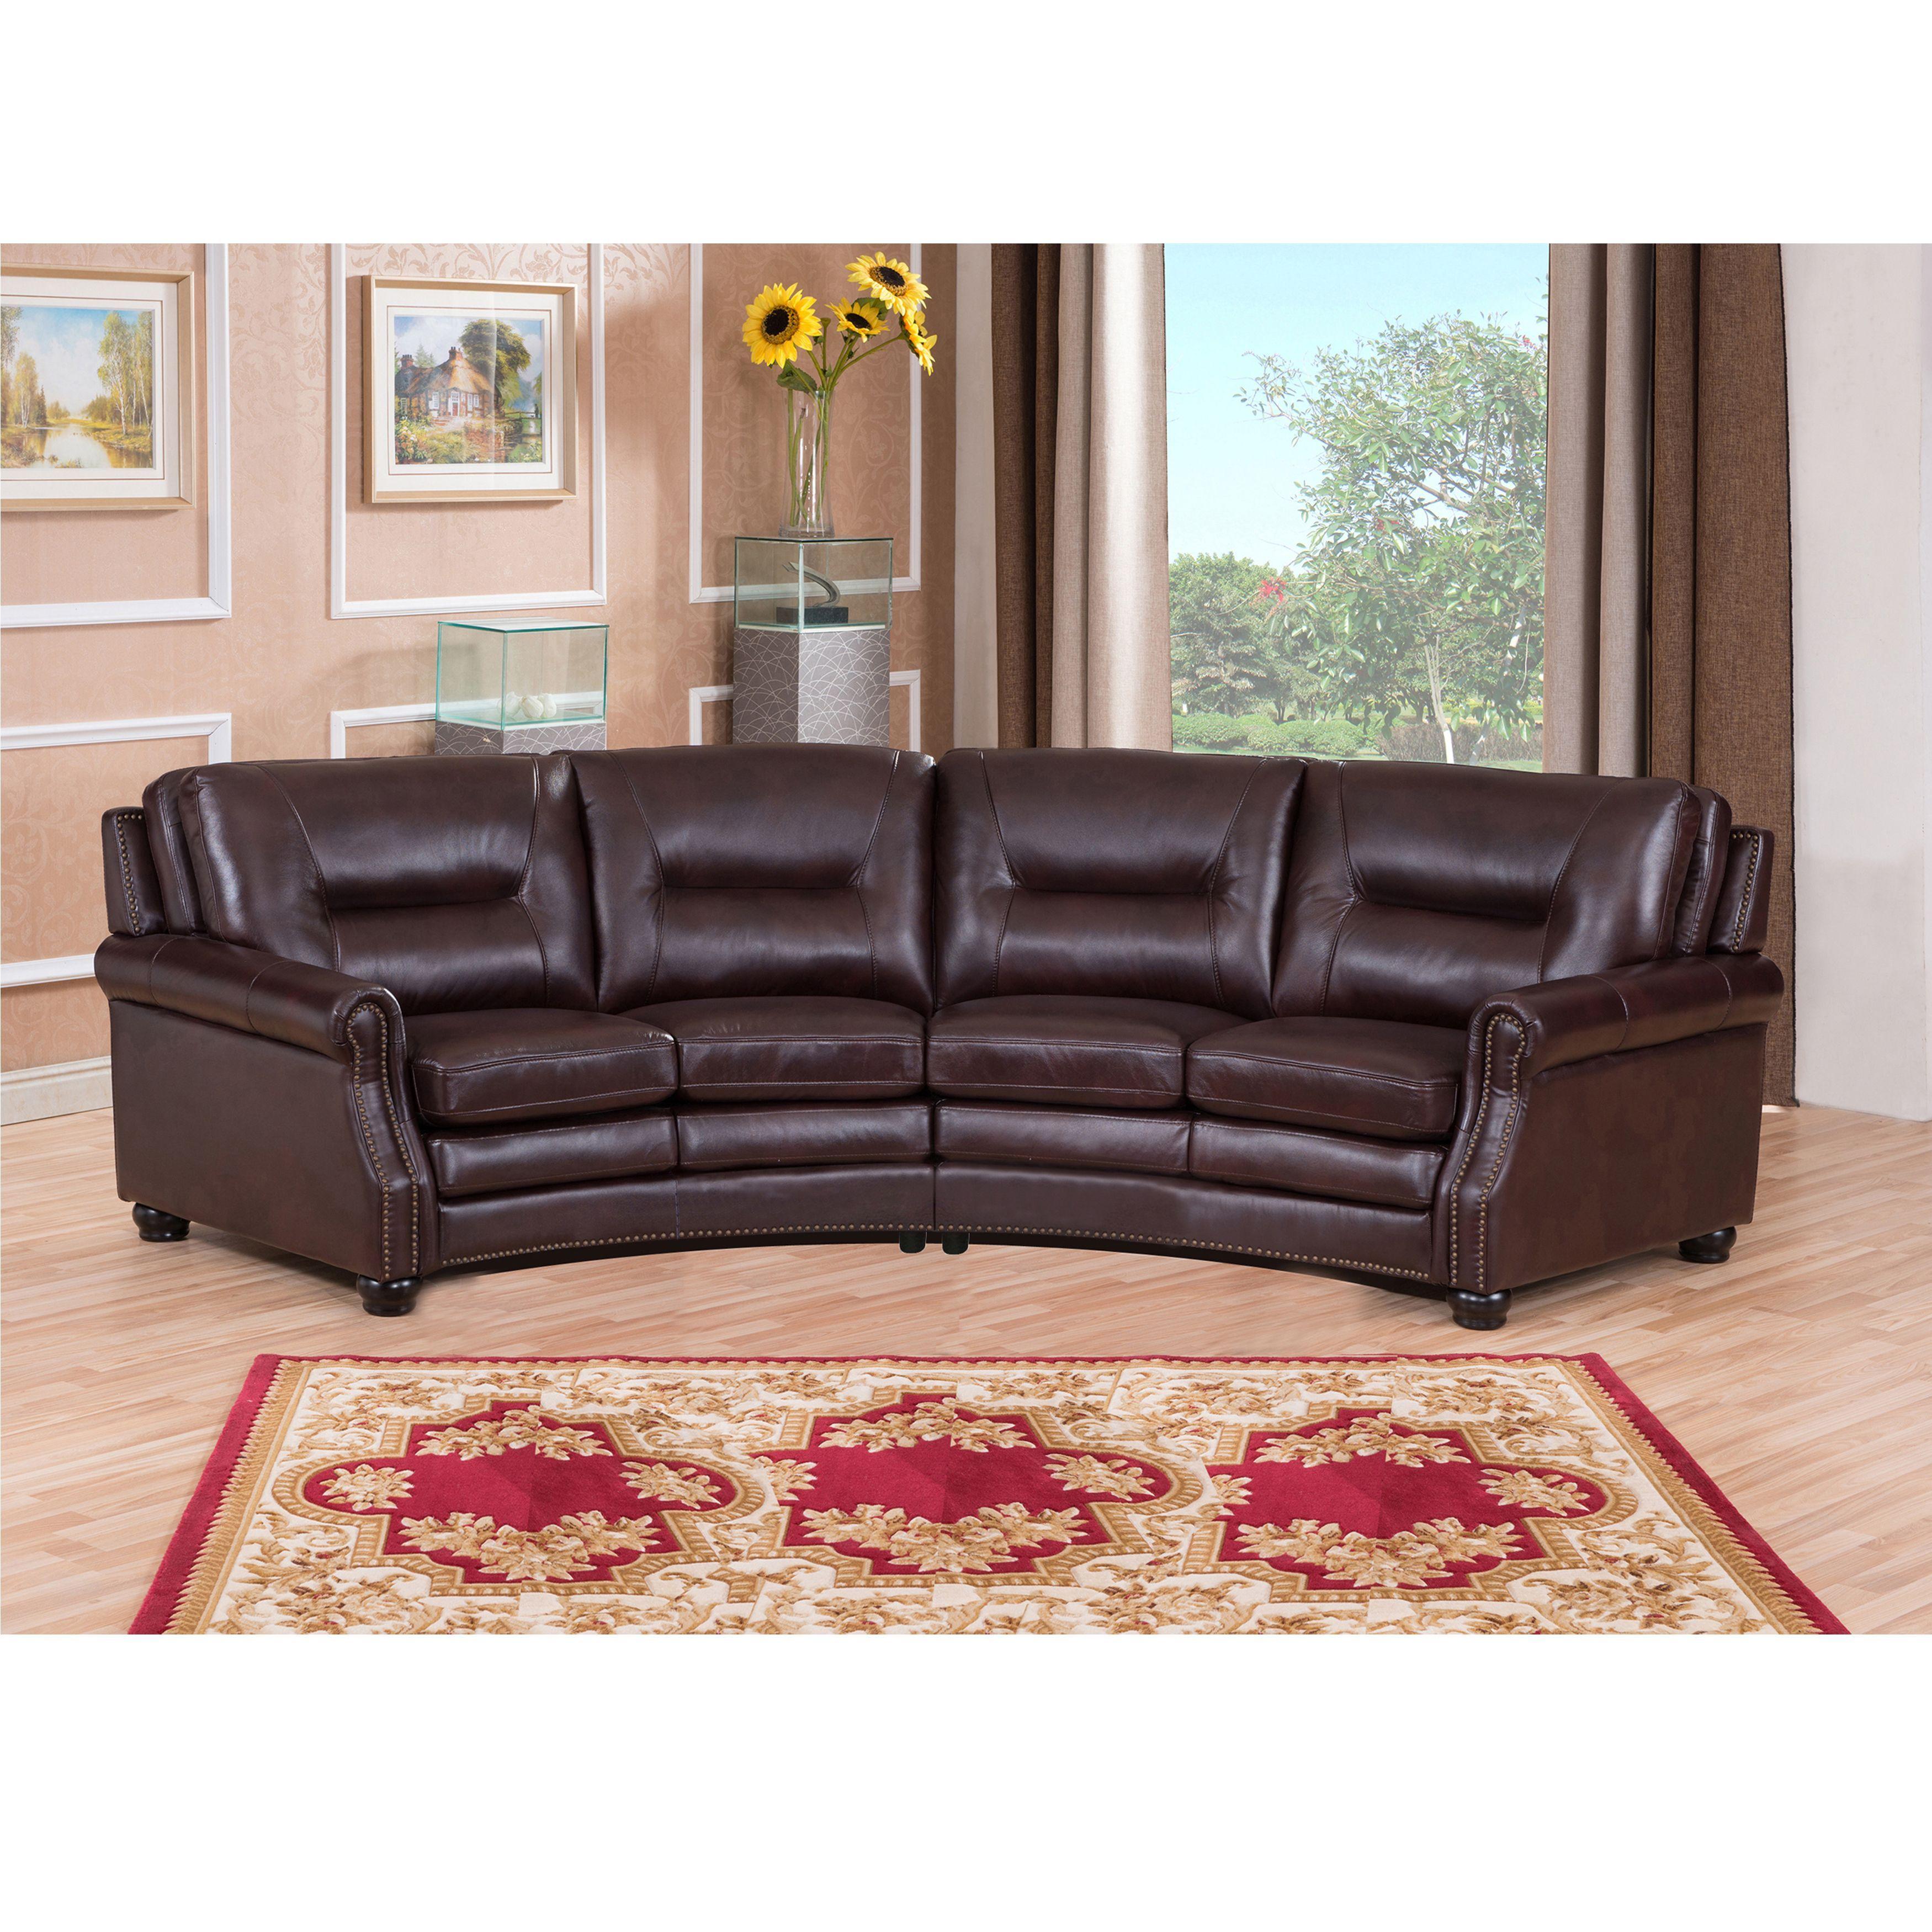 Incroyable Penn Chocolate Brown Curved Top Grain Leather Sectional Sofa